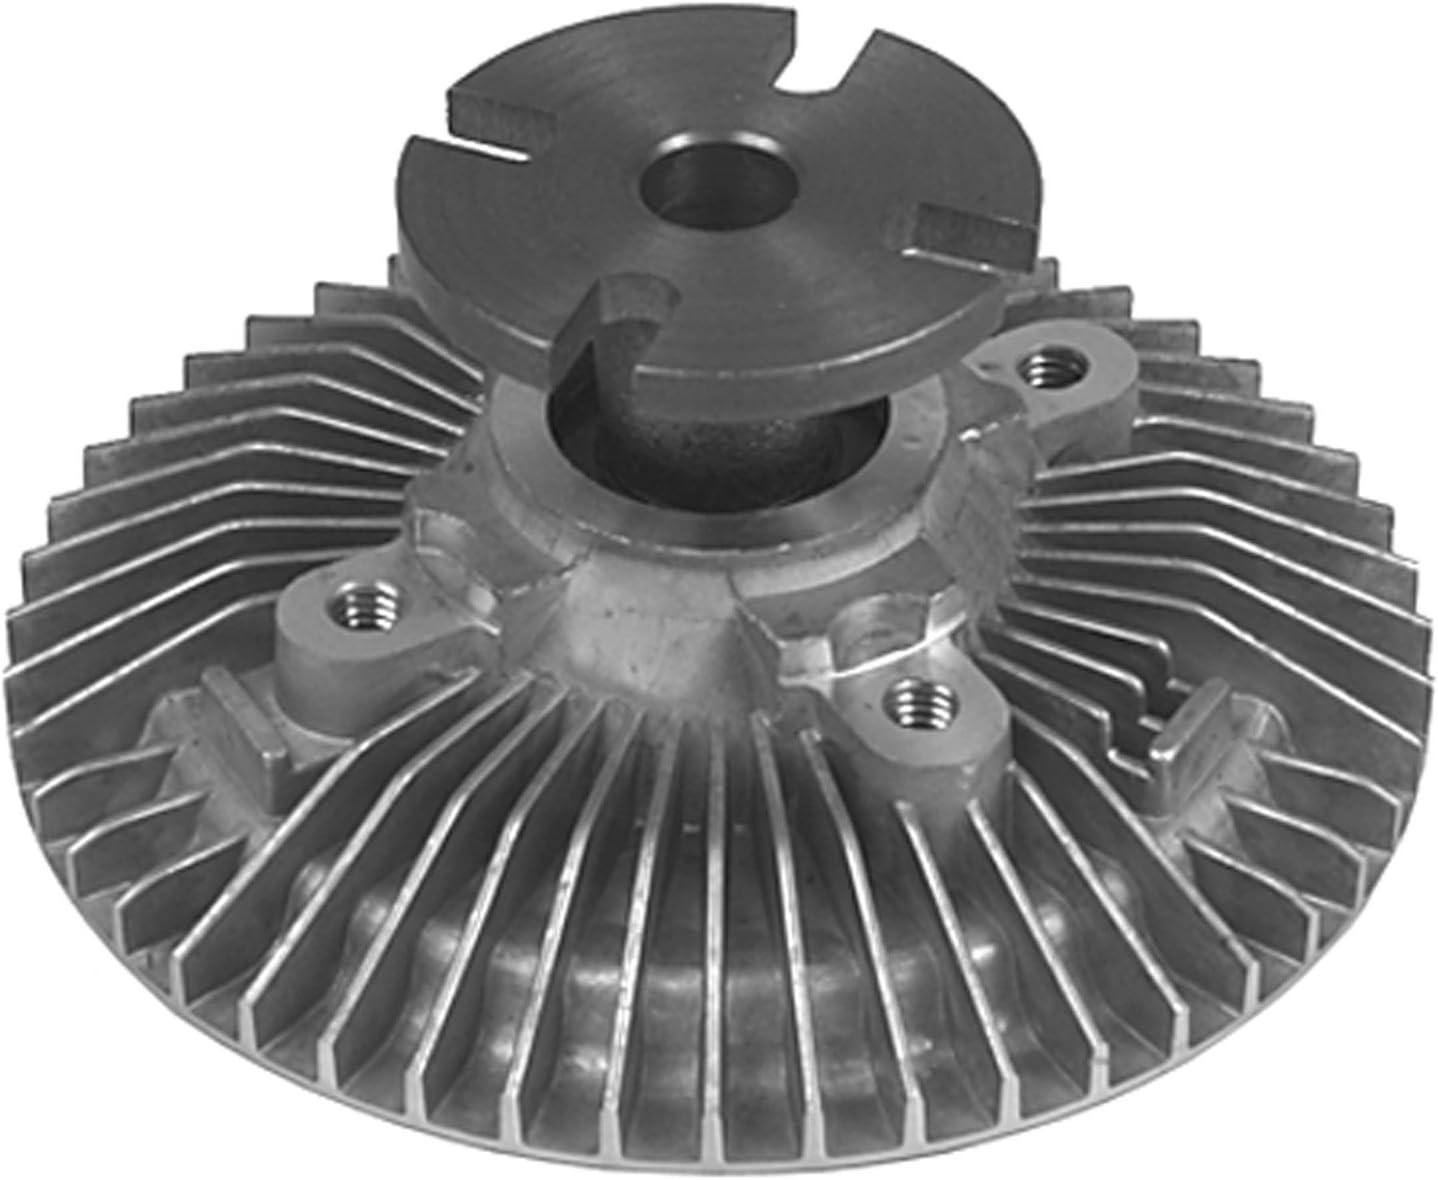 Hayden Automotive 2615 Premium Fan Clutch